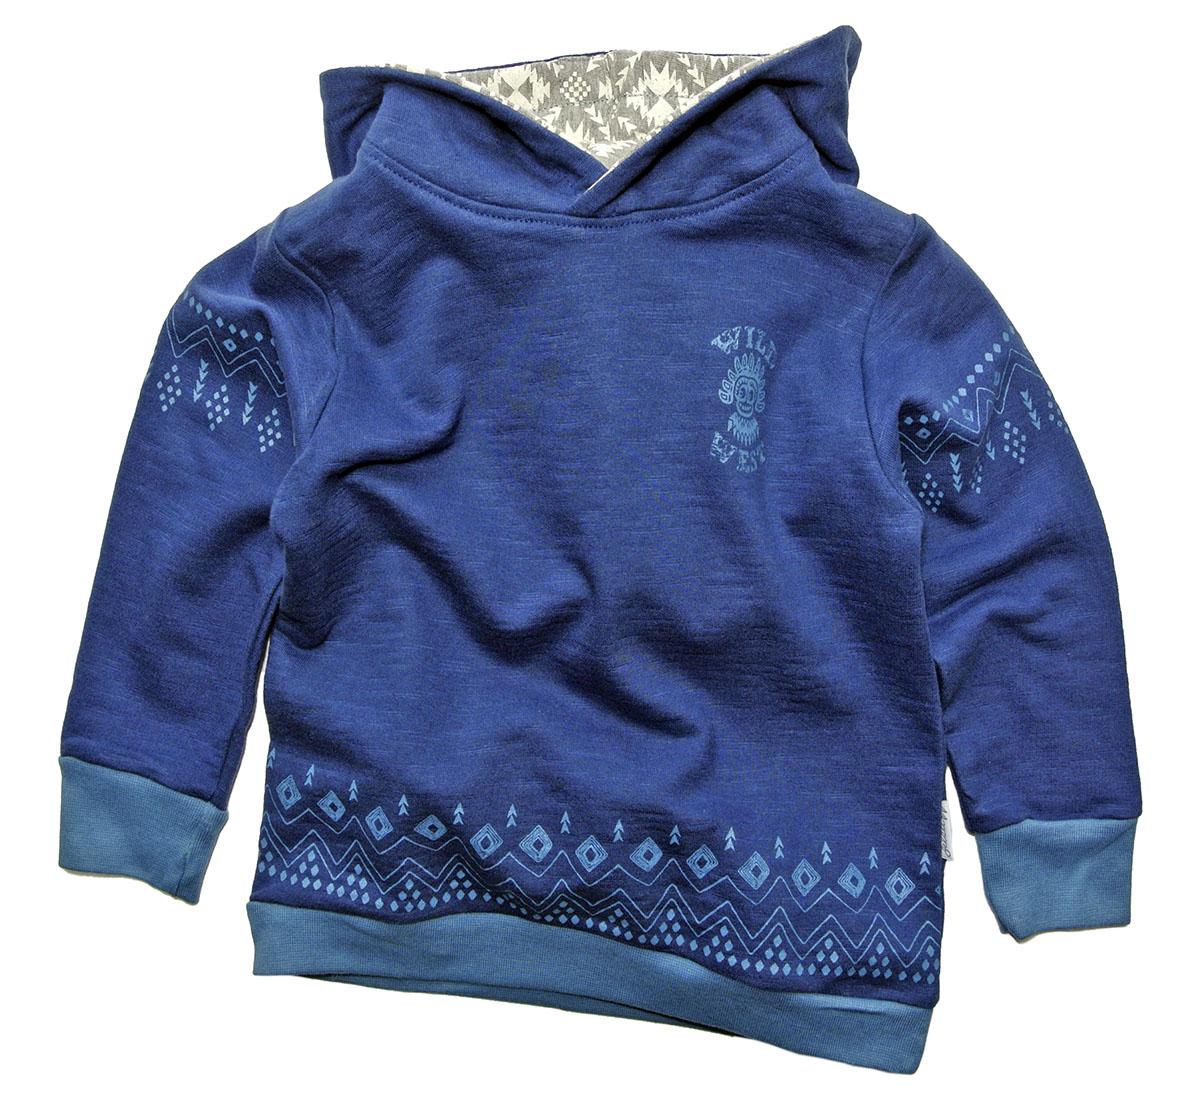 13c35a5ffc72 Gelati Chlapčenská mikina s kapucňou - tmavo modrá